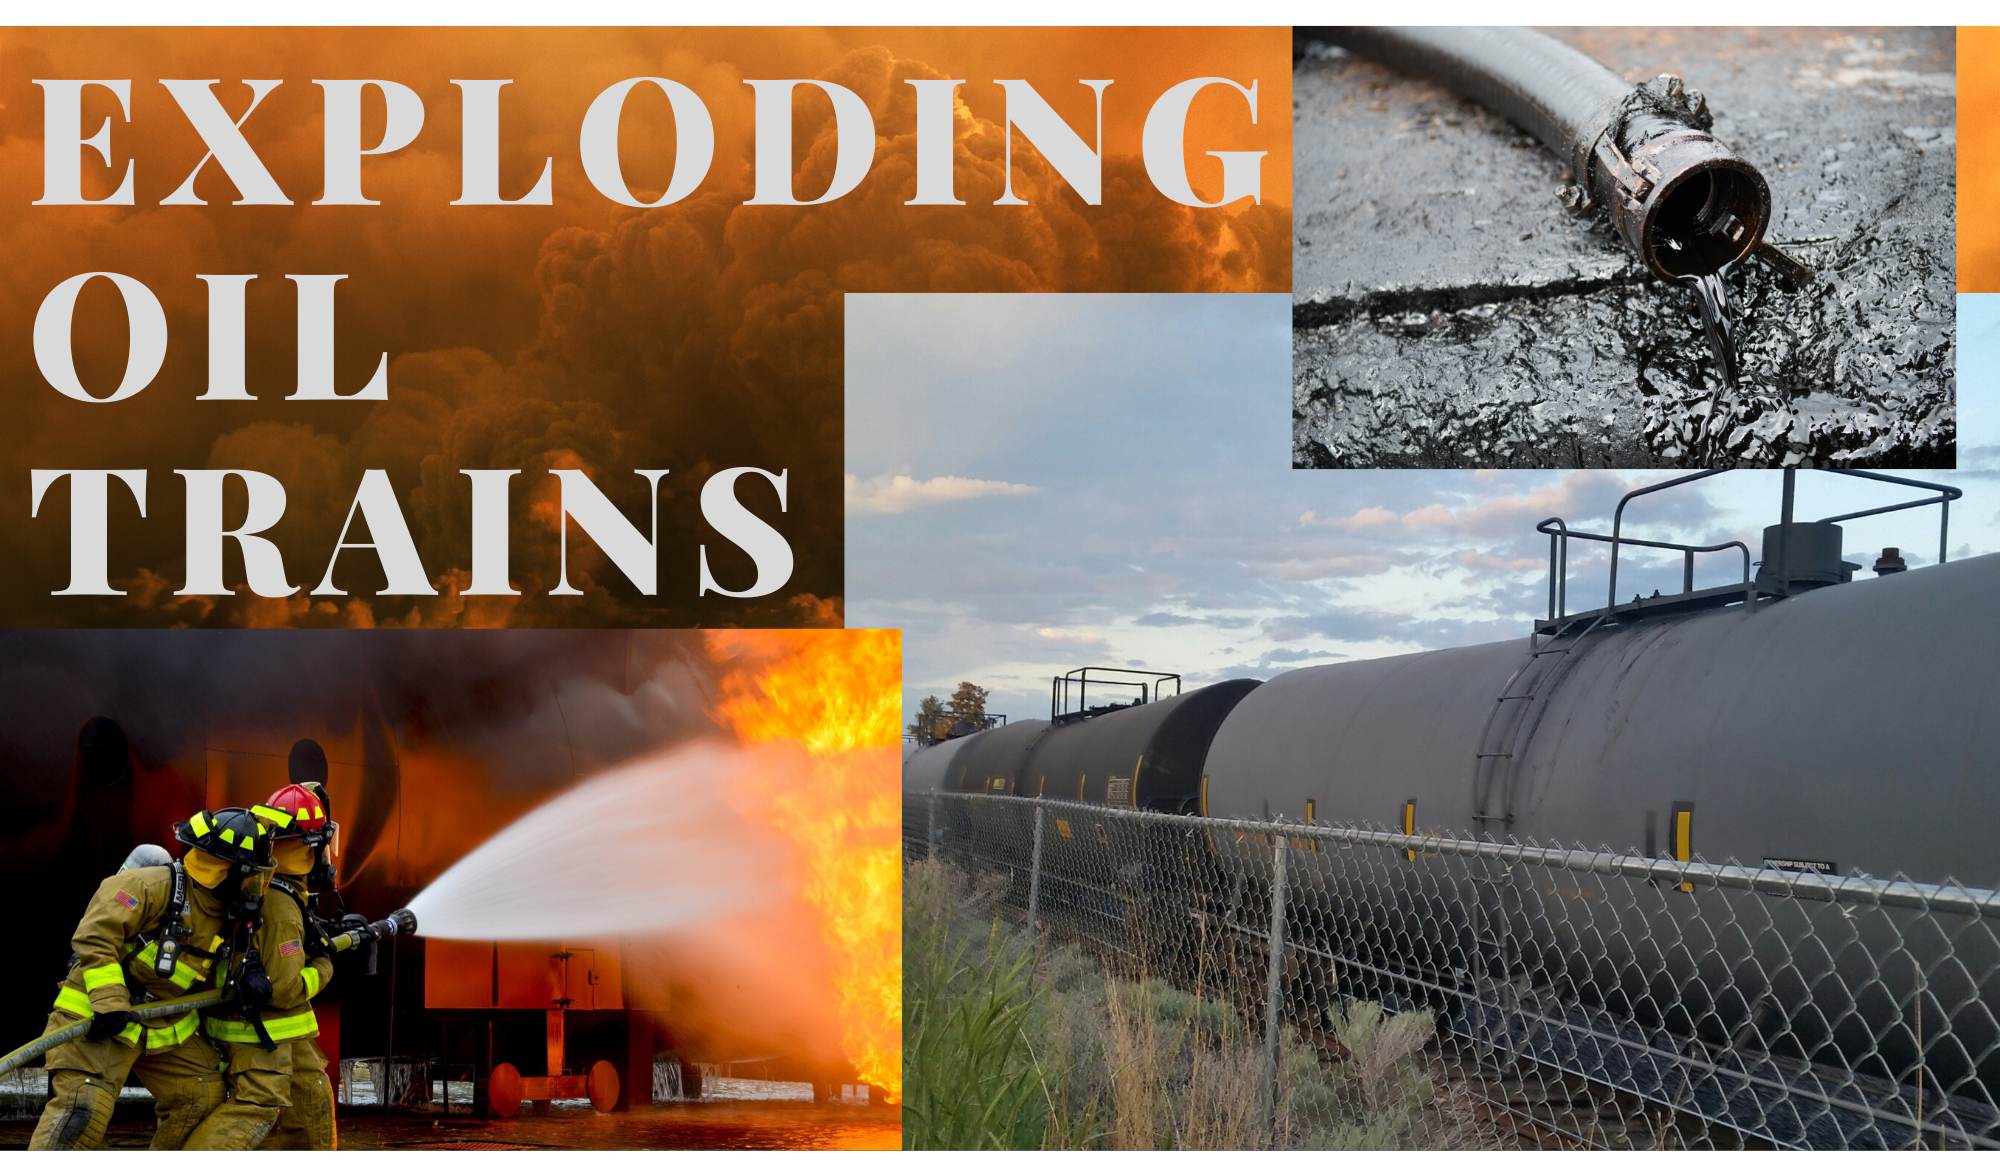 Exploding_oil_trains3